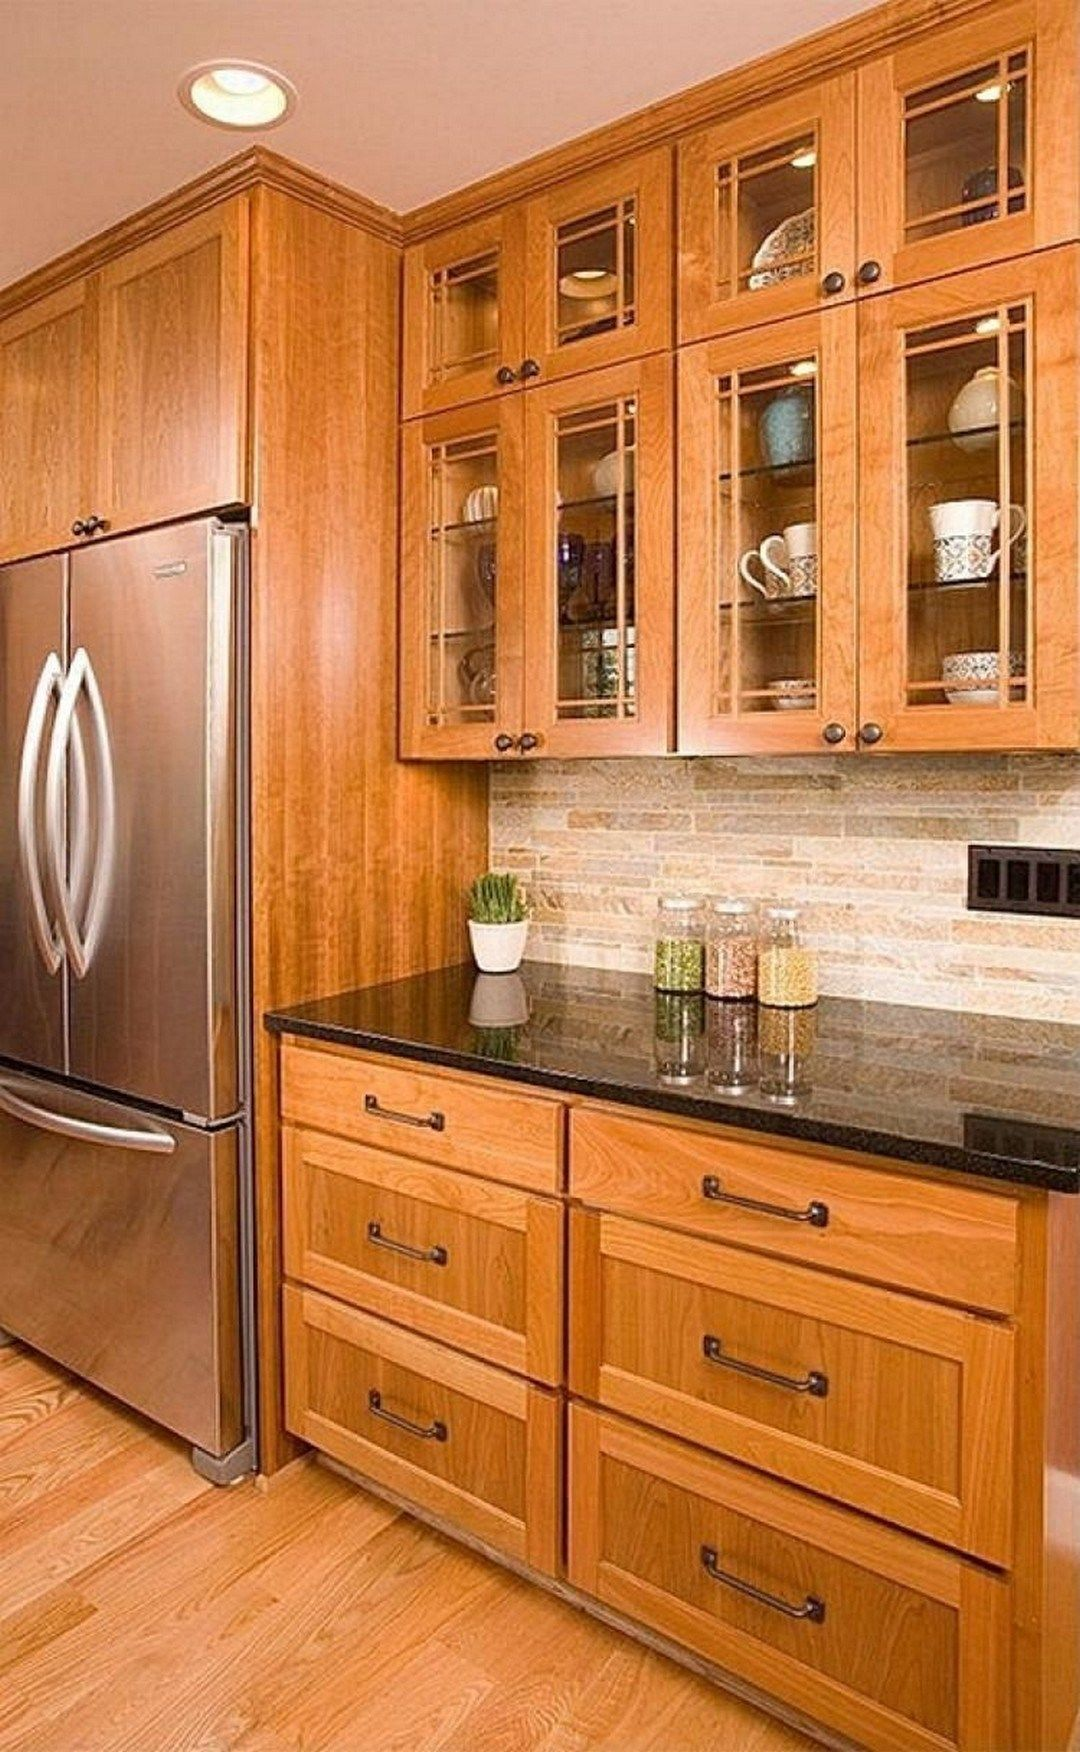 - 29 Fantastic Kitchen Backsplash Ideas With Oak Cabinets (3) New